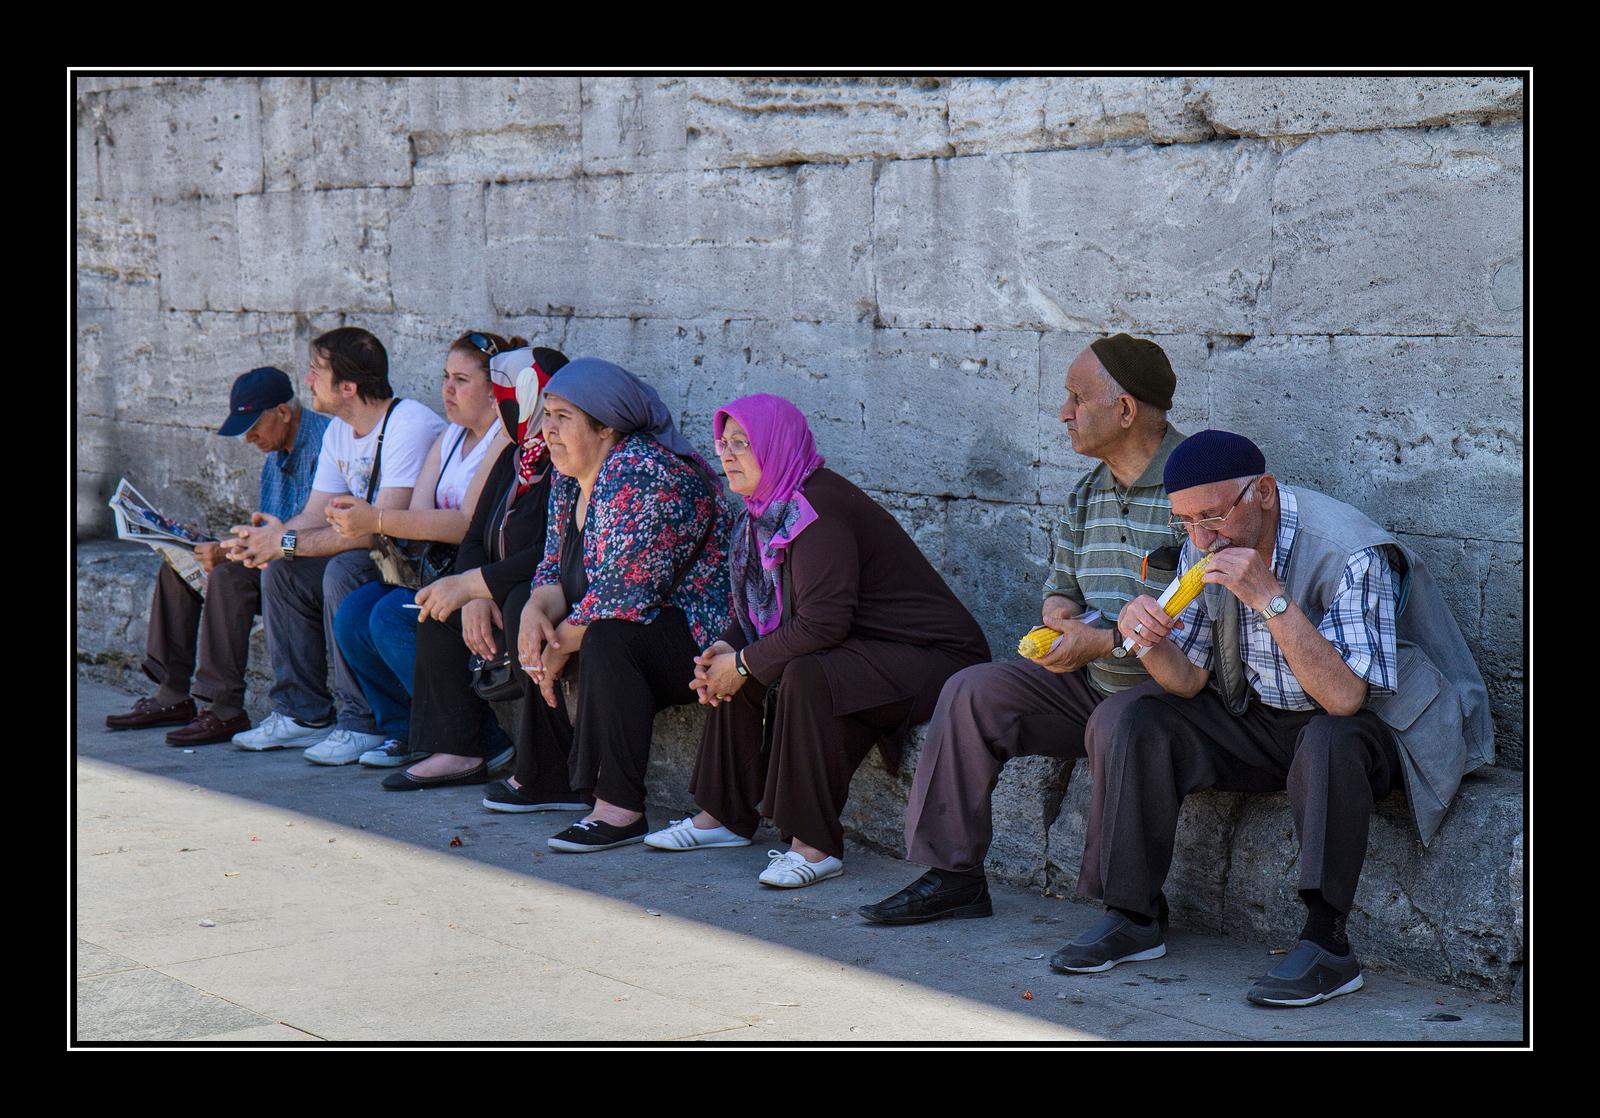 IMAGE: https://photos.smugmug.com/Travel/Istanbul/i-ZrV93DB/0/2a165483/X3/Street%20scene%2011-X3.jpg